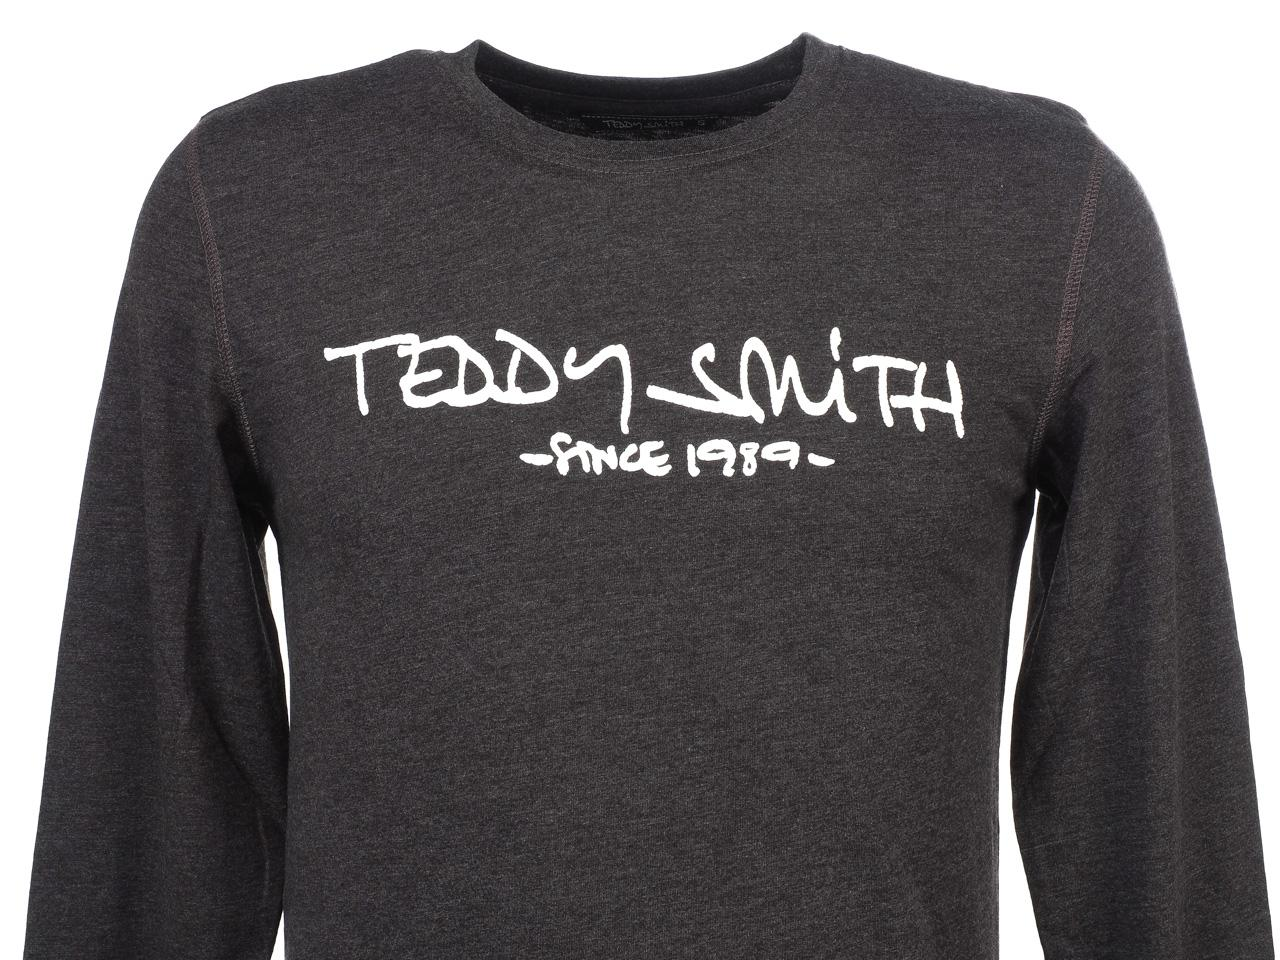 Tee-shirt-manches-longues-Teddy-smith-Ticlass-3-anc-ecru-ml-tee-Gris-65654-Neu